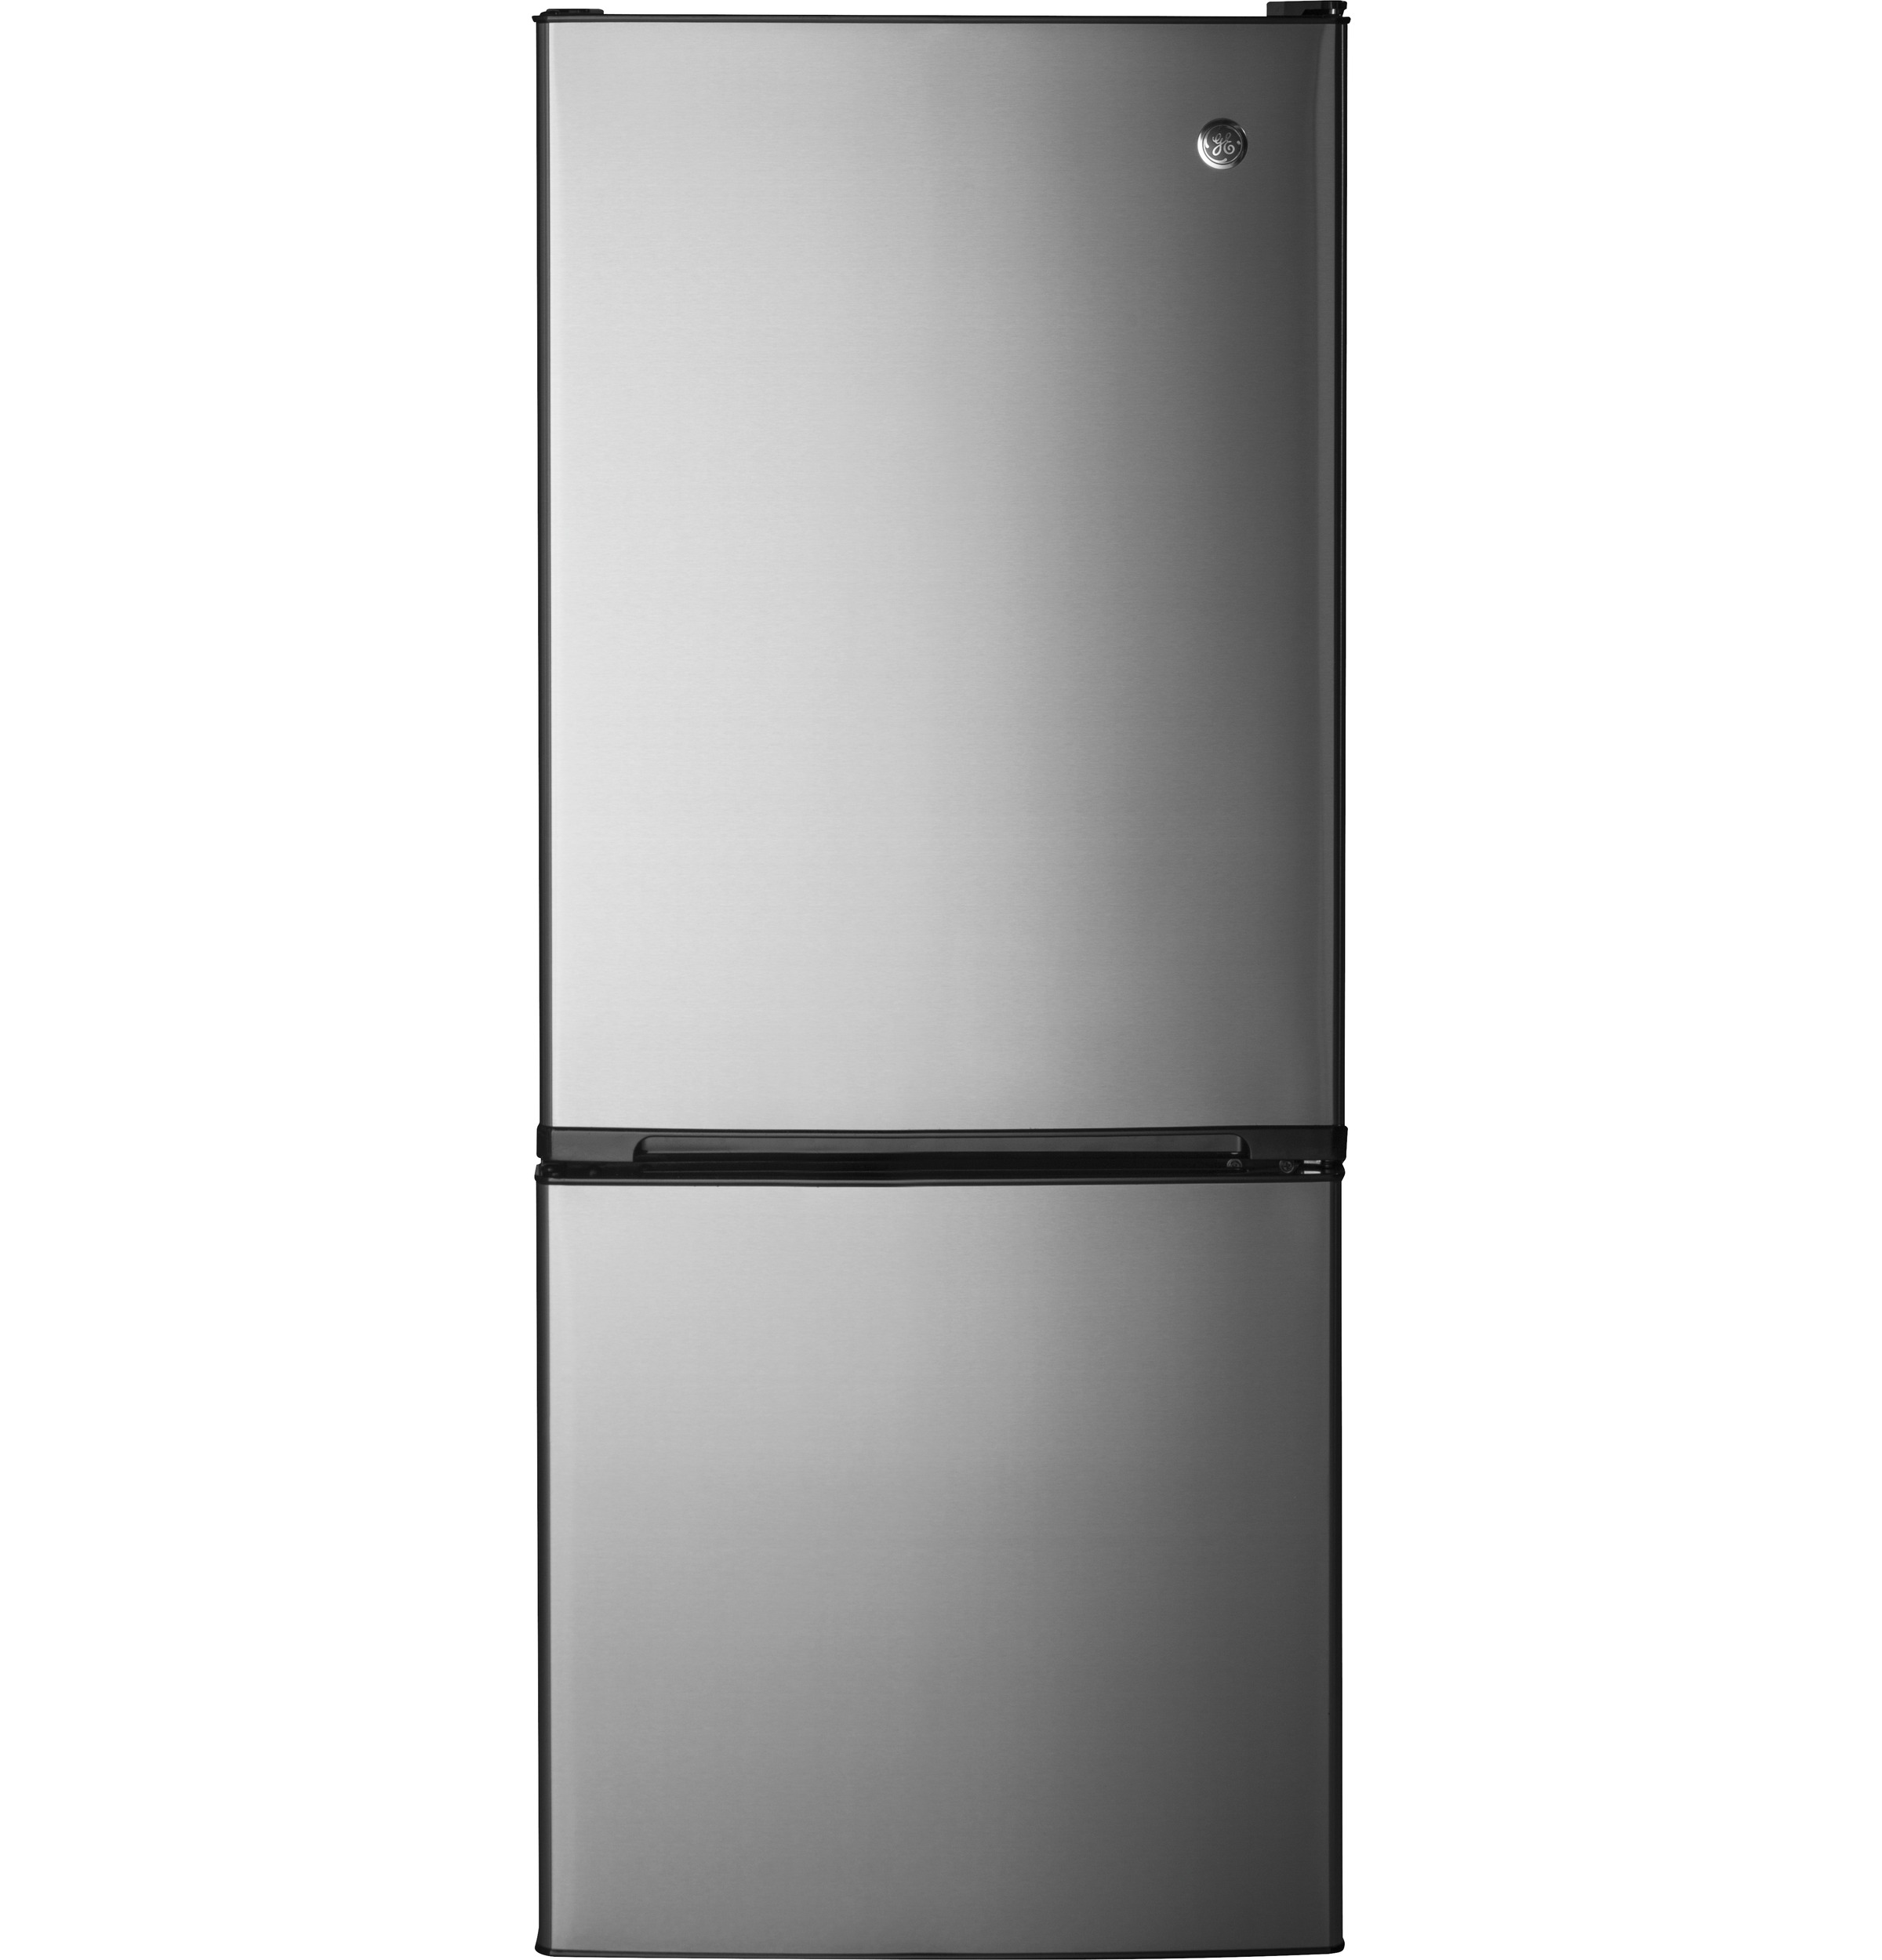 10.5 Cu. Ft. Bottom-Freezer Refrigerator